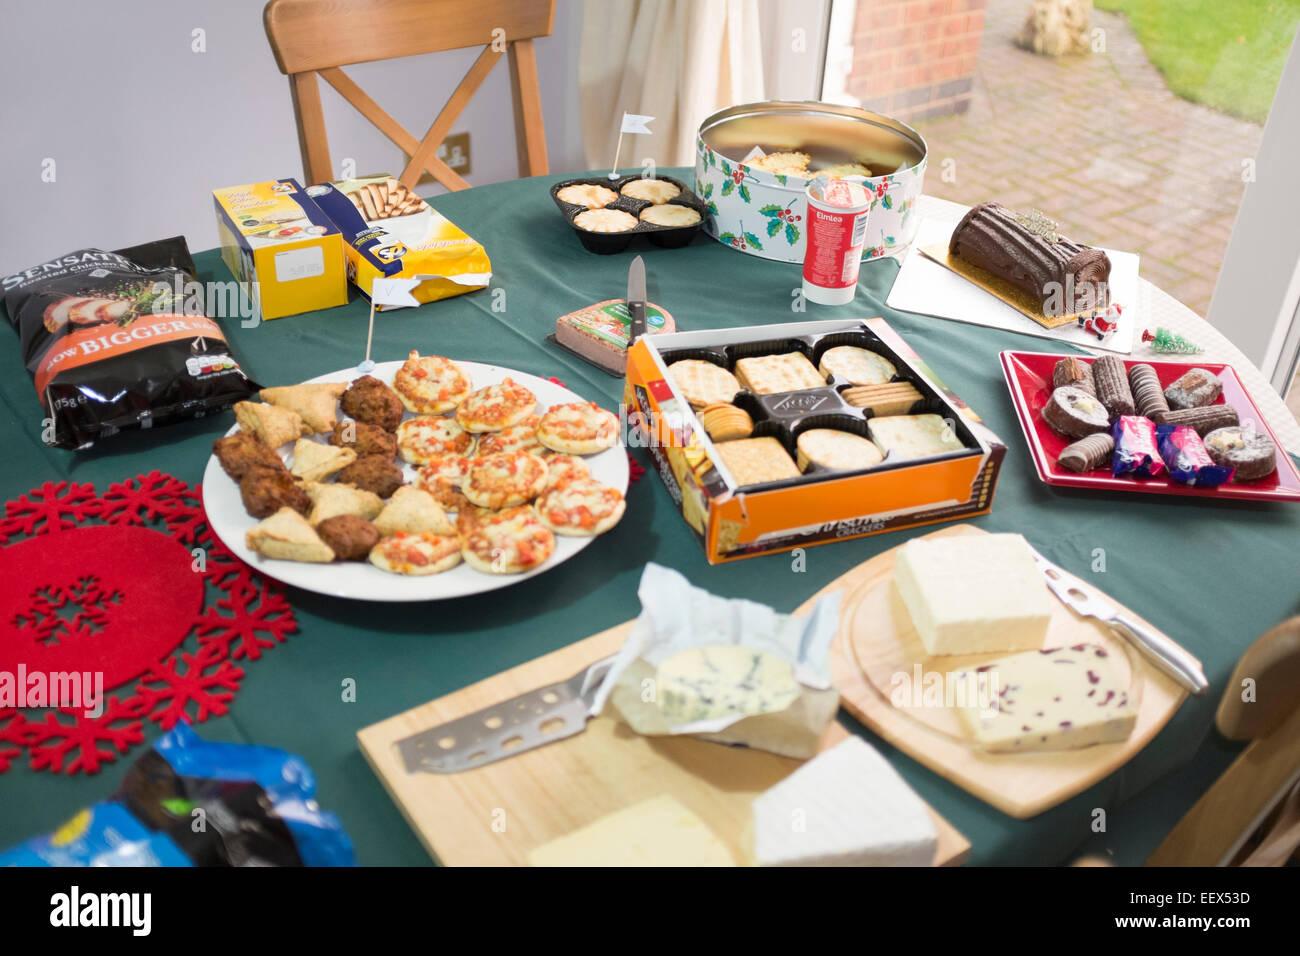 Christmas Buffet Table Lunch Gluten Free Coeliac Stock Photo